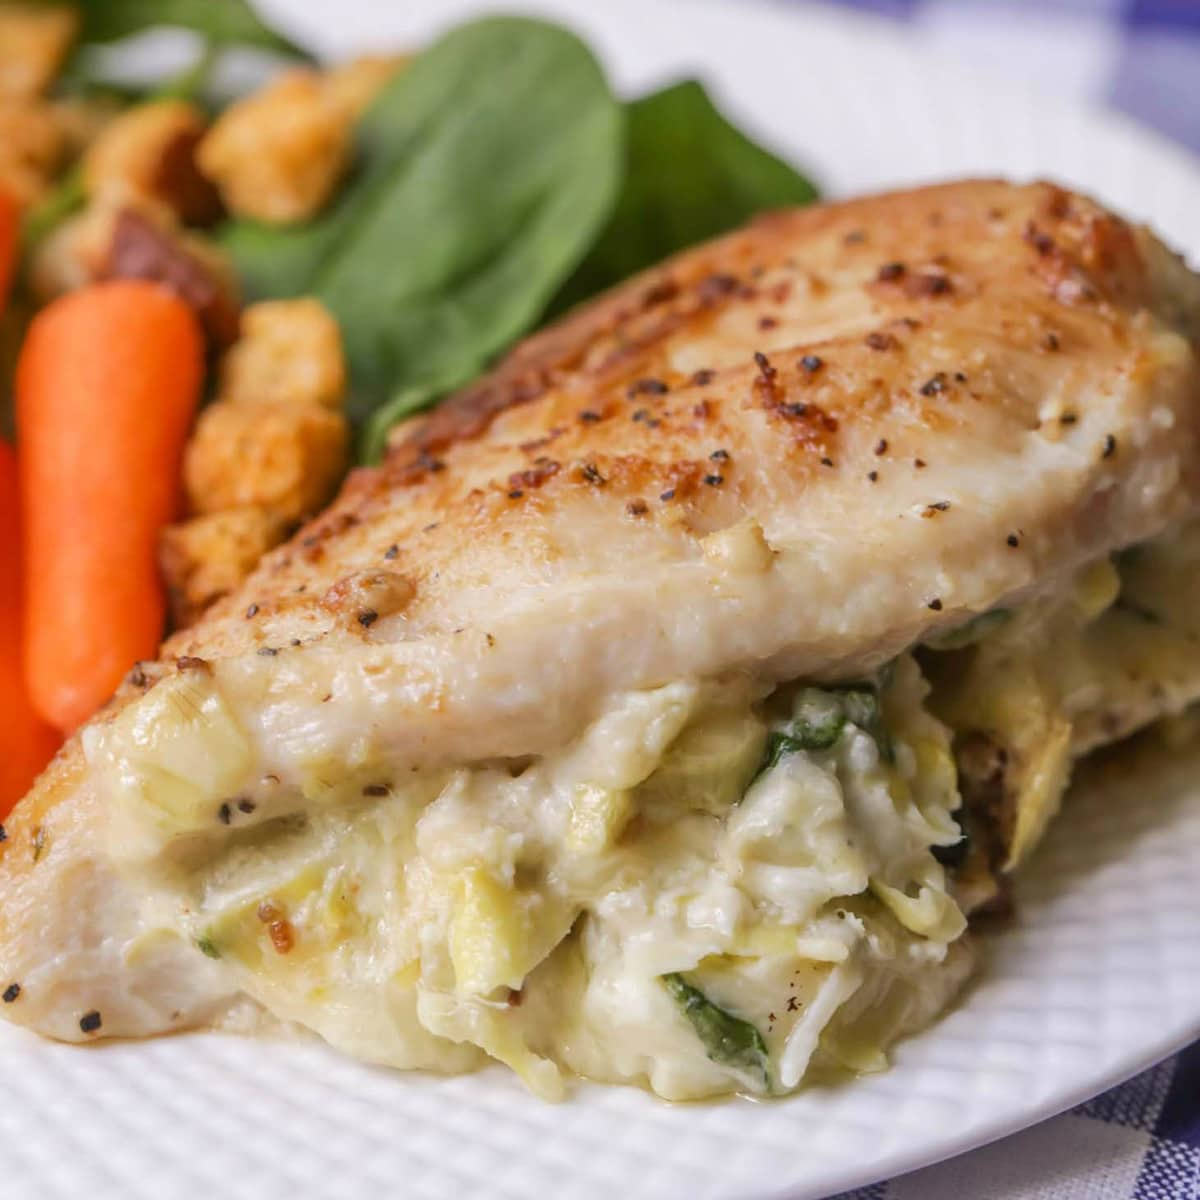 Stuffed chicken breast recipes - close up